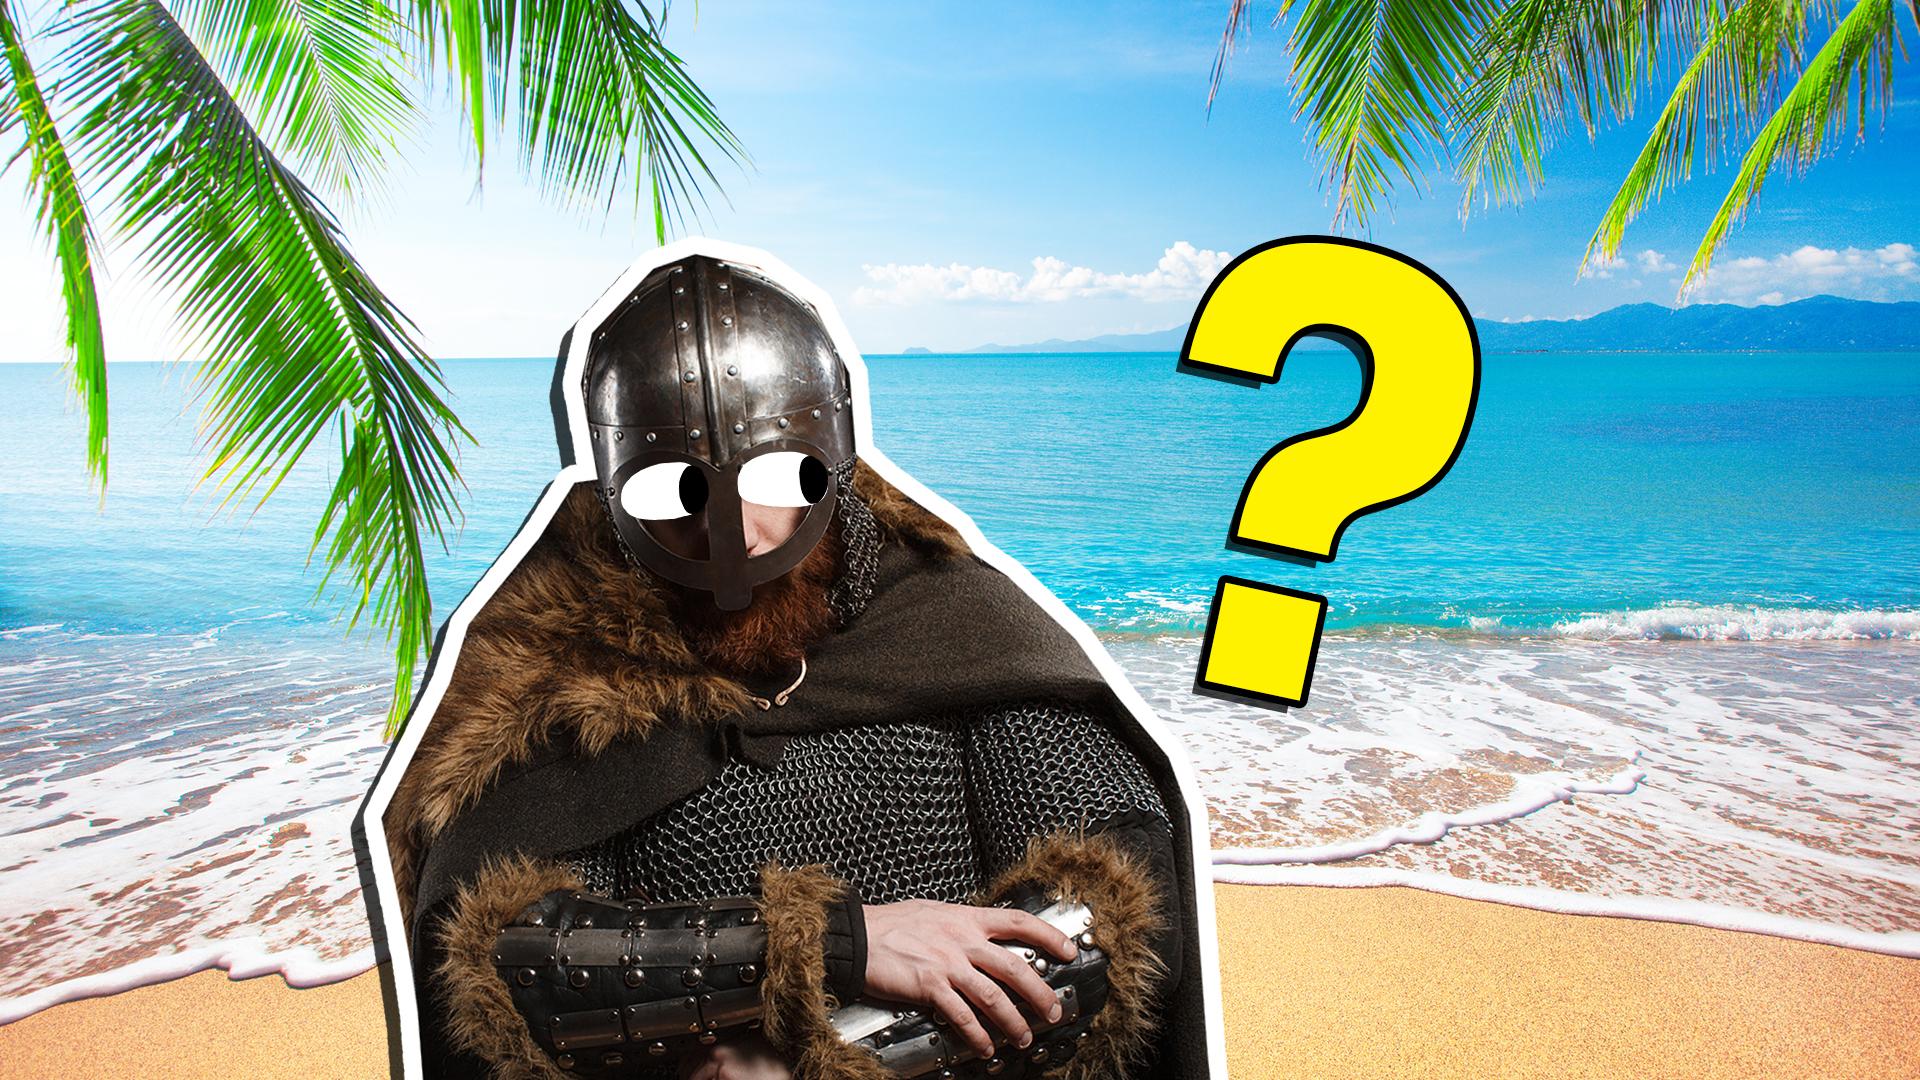 Viking warrior standing on a beach